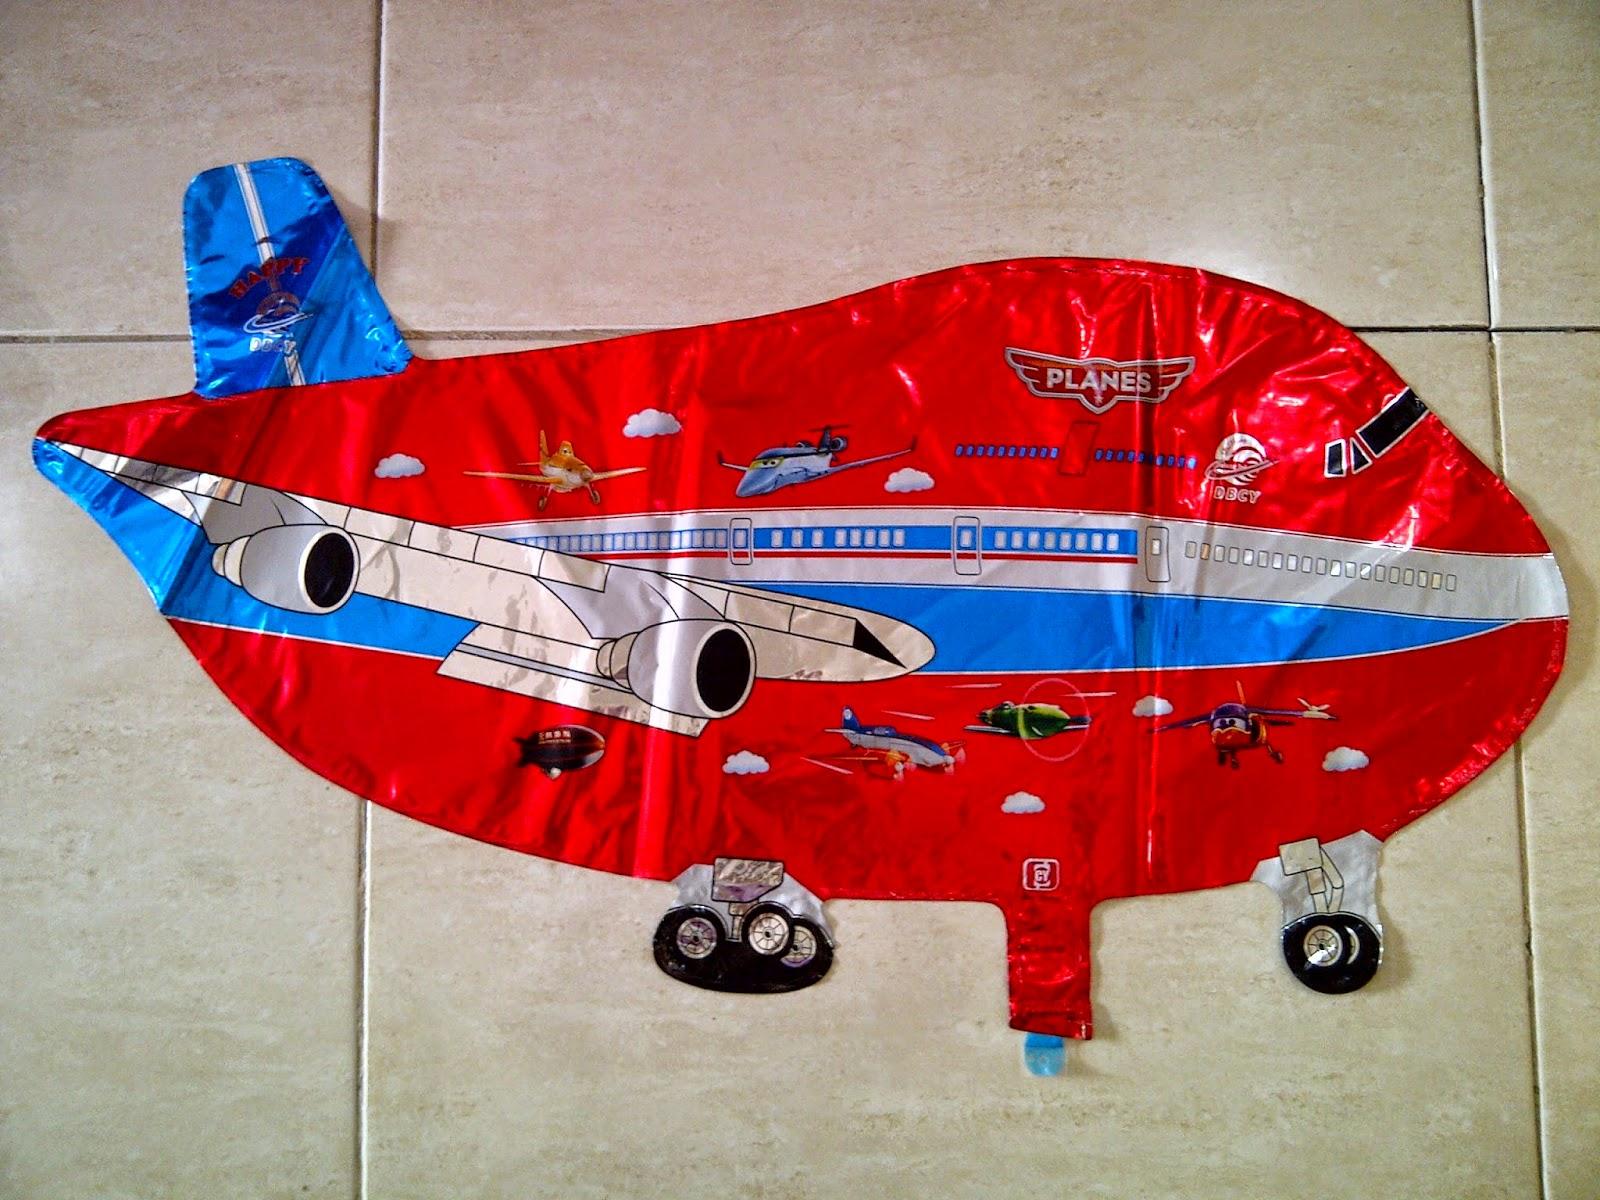 Balon Character Pesawat Baru Metalik Merah Anugerah Utama Toys Mainan